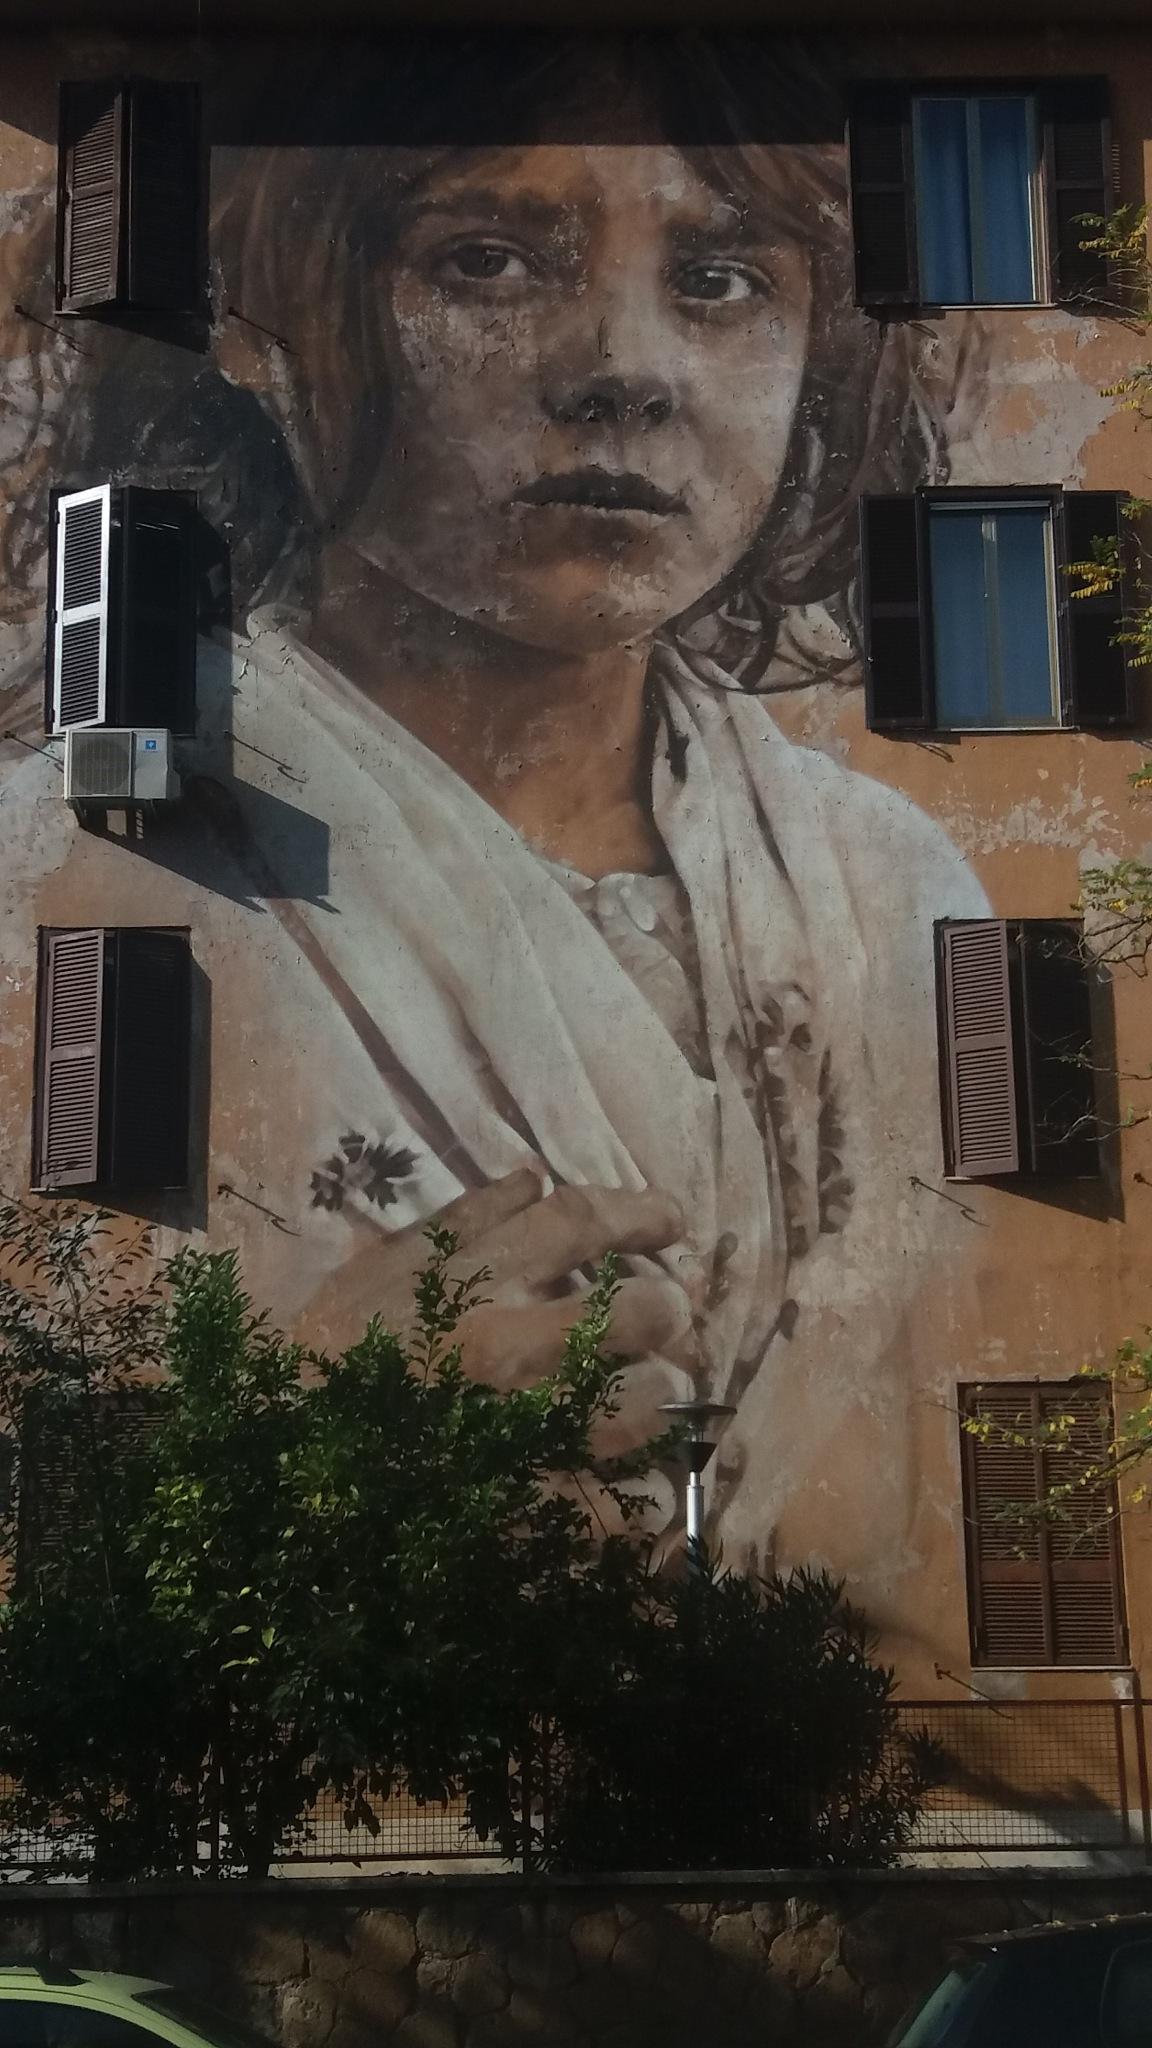 street art in Rome by gigi.sorrentino1